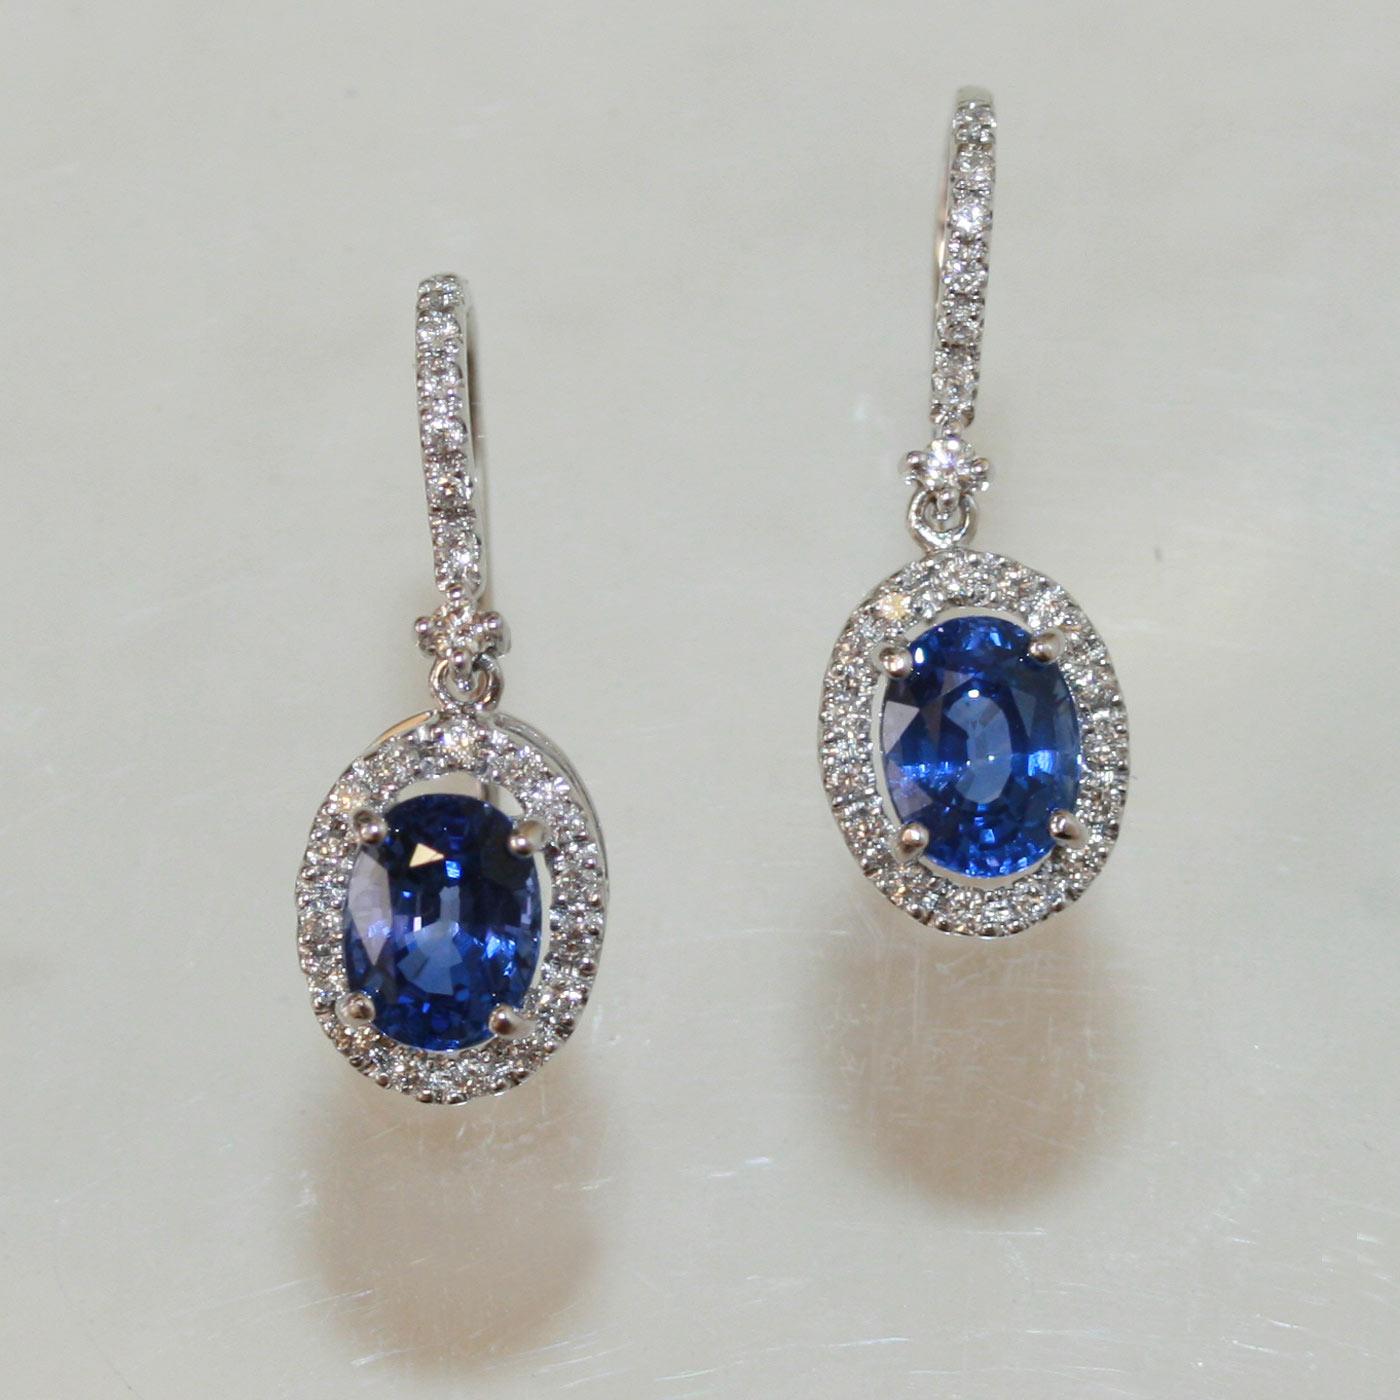 Buy Ceylonese Sapphire Drop Earrings Sold Items Sold